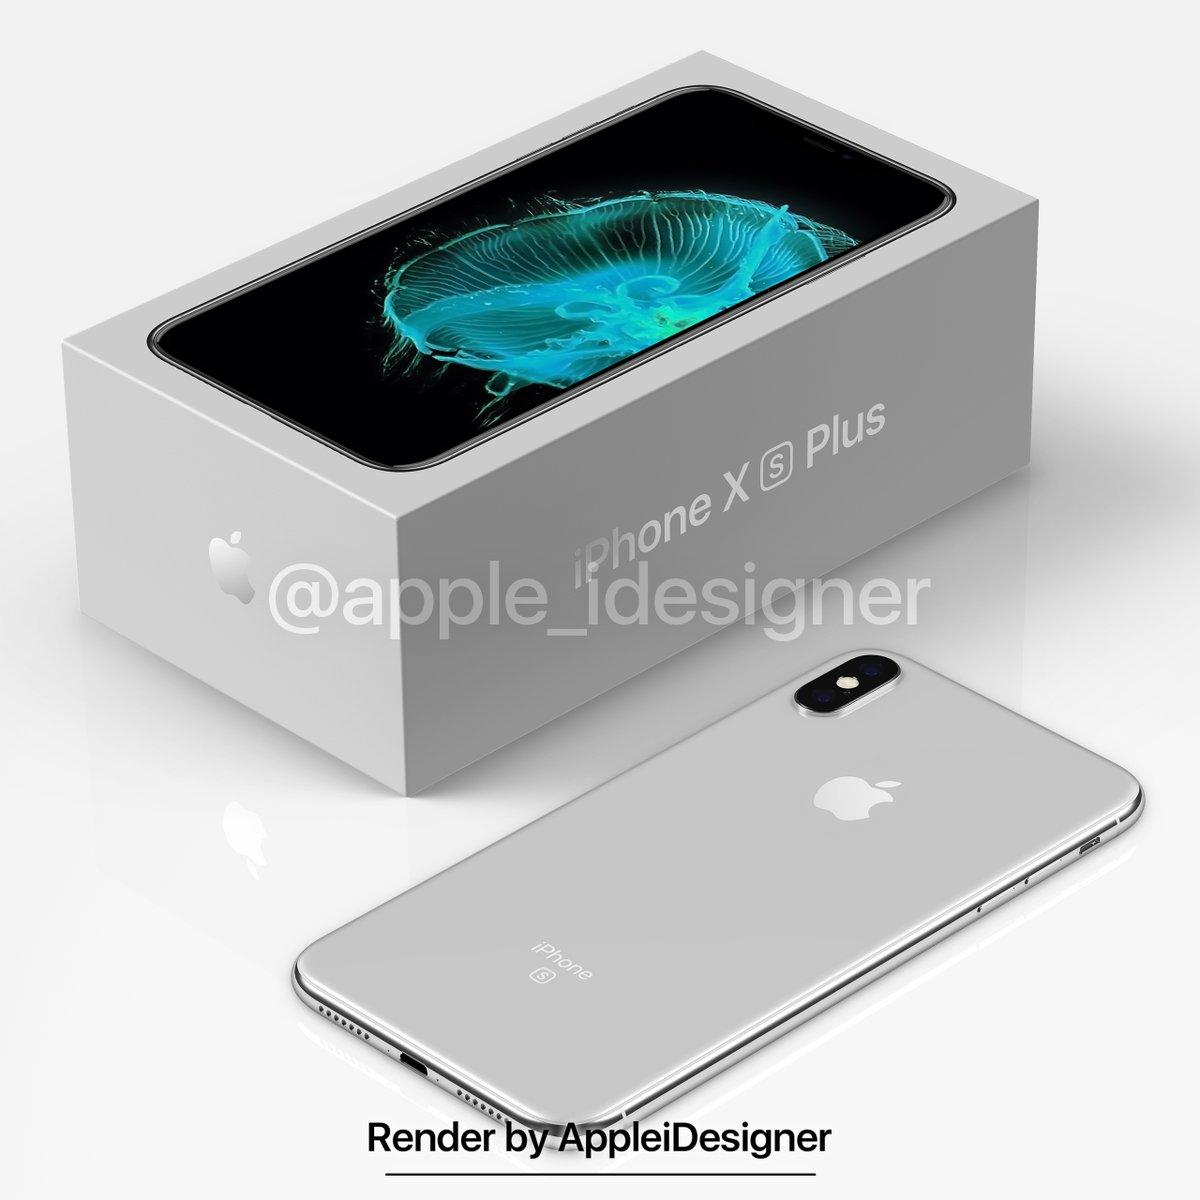 Iphone X Plus Render By Appleidesigner 3